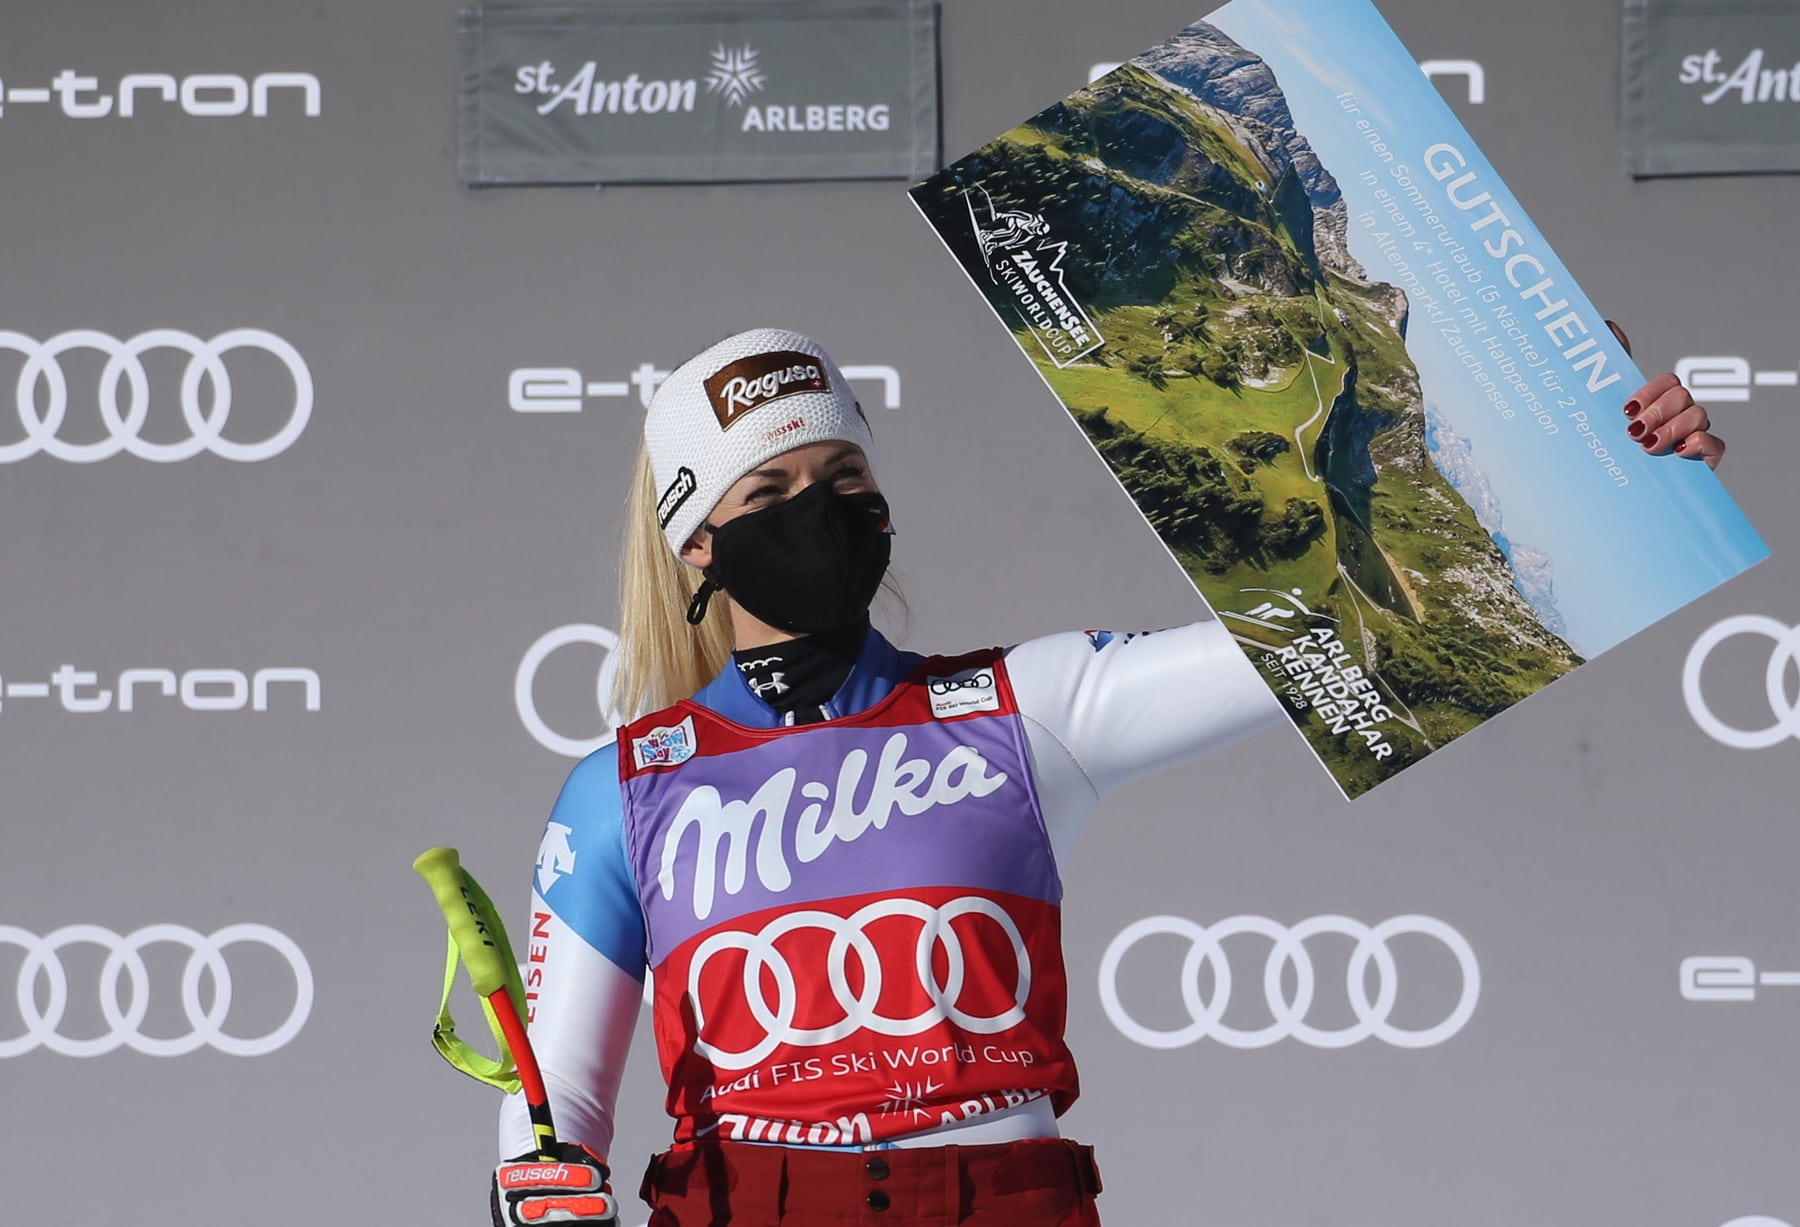 SANKT ANTON,AUSTRIA,10.JAN.21 - ALPINE SKIING - FIS World Cup, Super G, ladies, award ceremony. Image shows Lara Gut-Behrami (SUI). Photo: GEPA pictures/ Daniel Goetzhaber